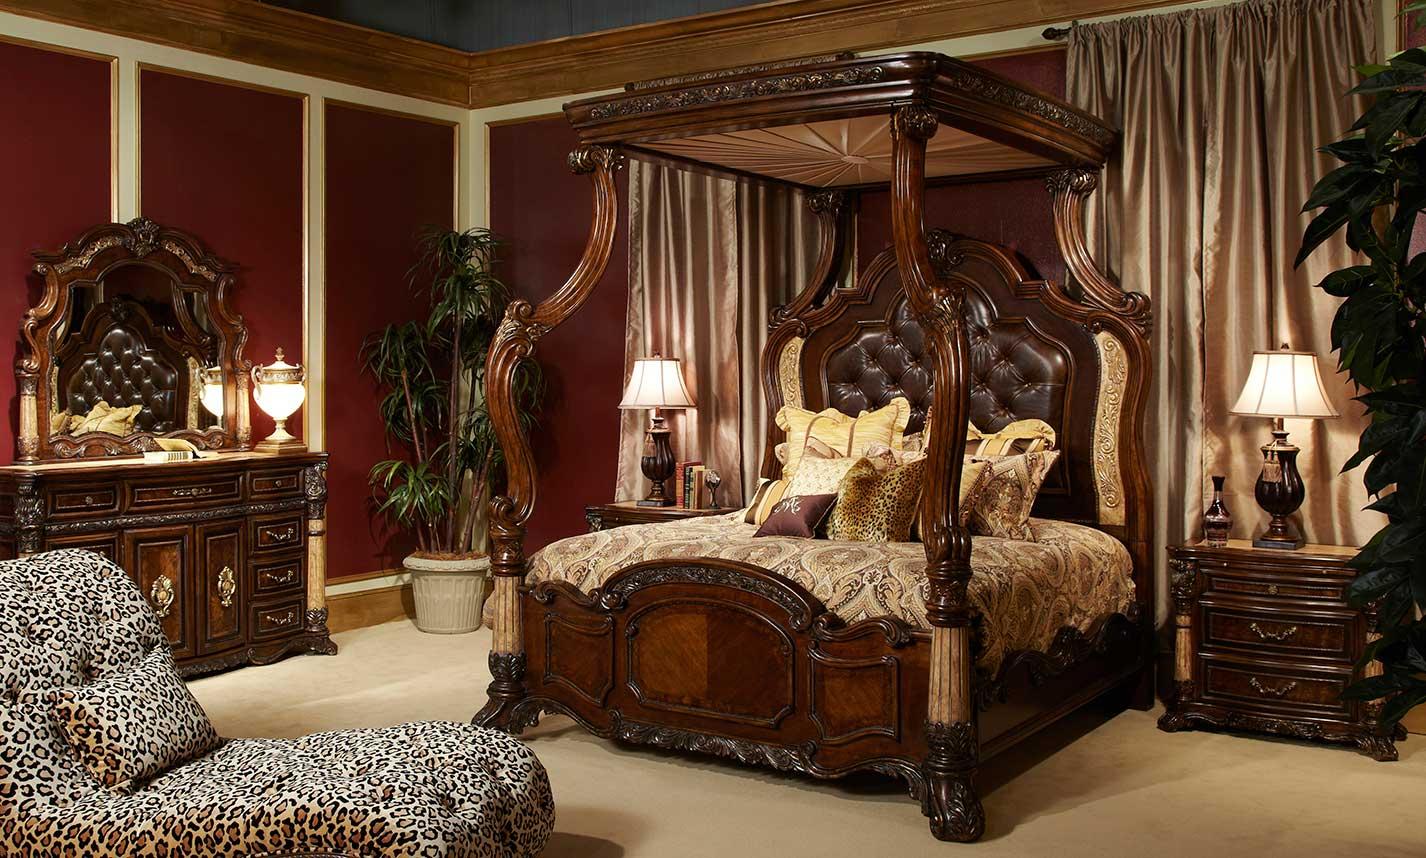 Victoria Palace Bedroom